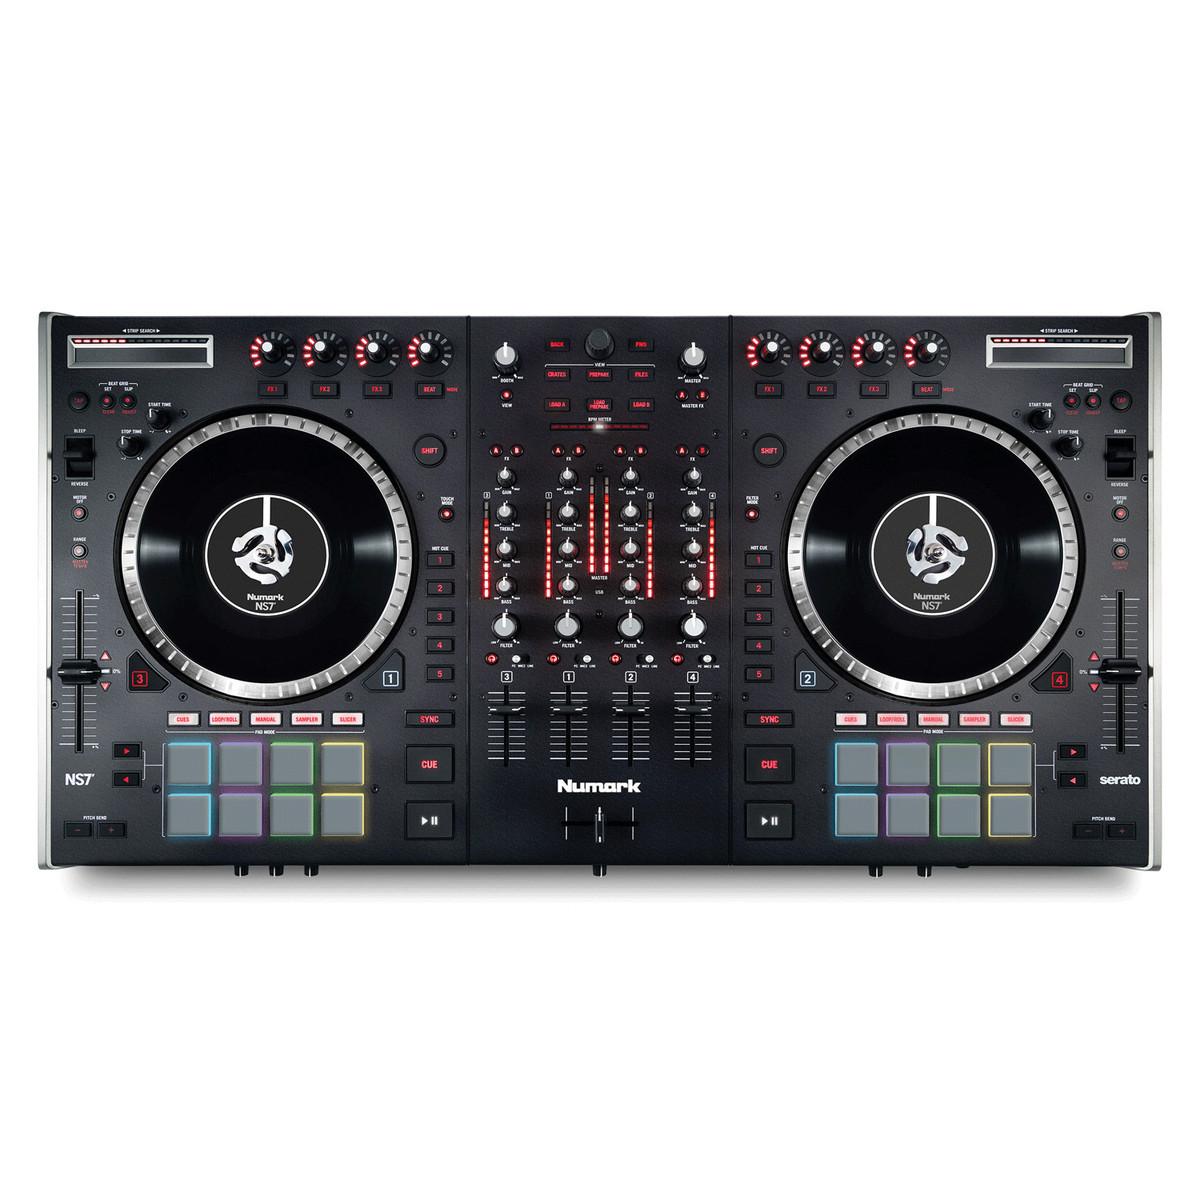 Numark NS7 II 4-Channel DJ Performance Controller - Ex Demo